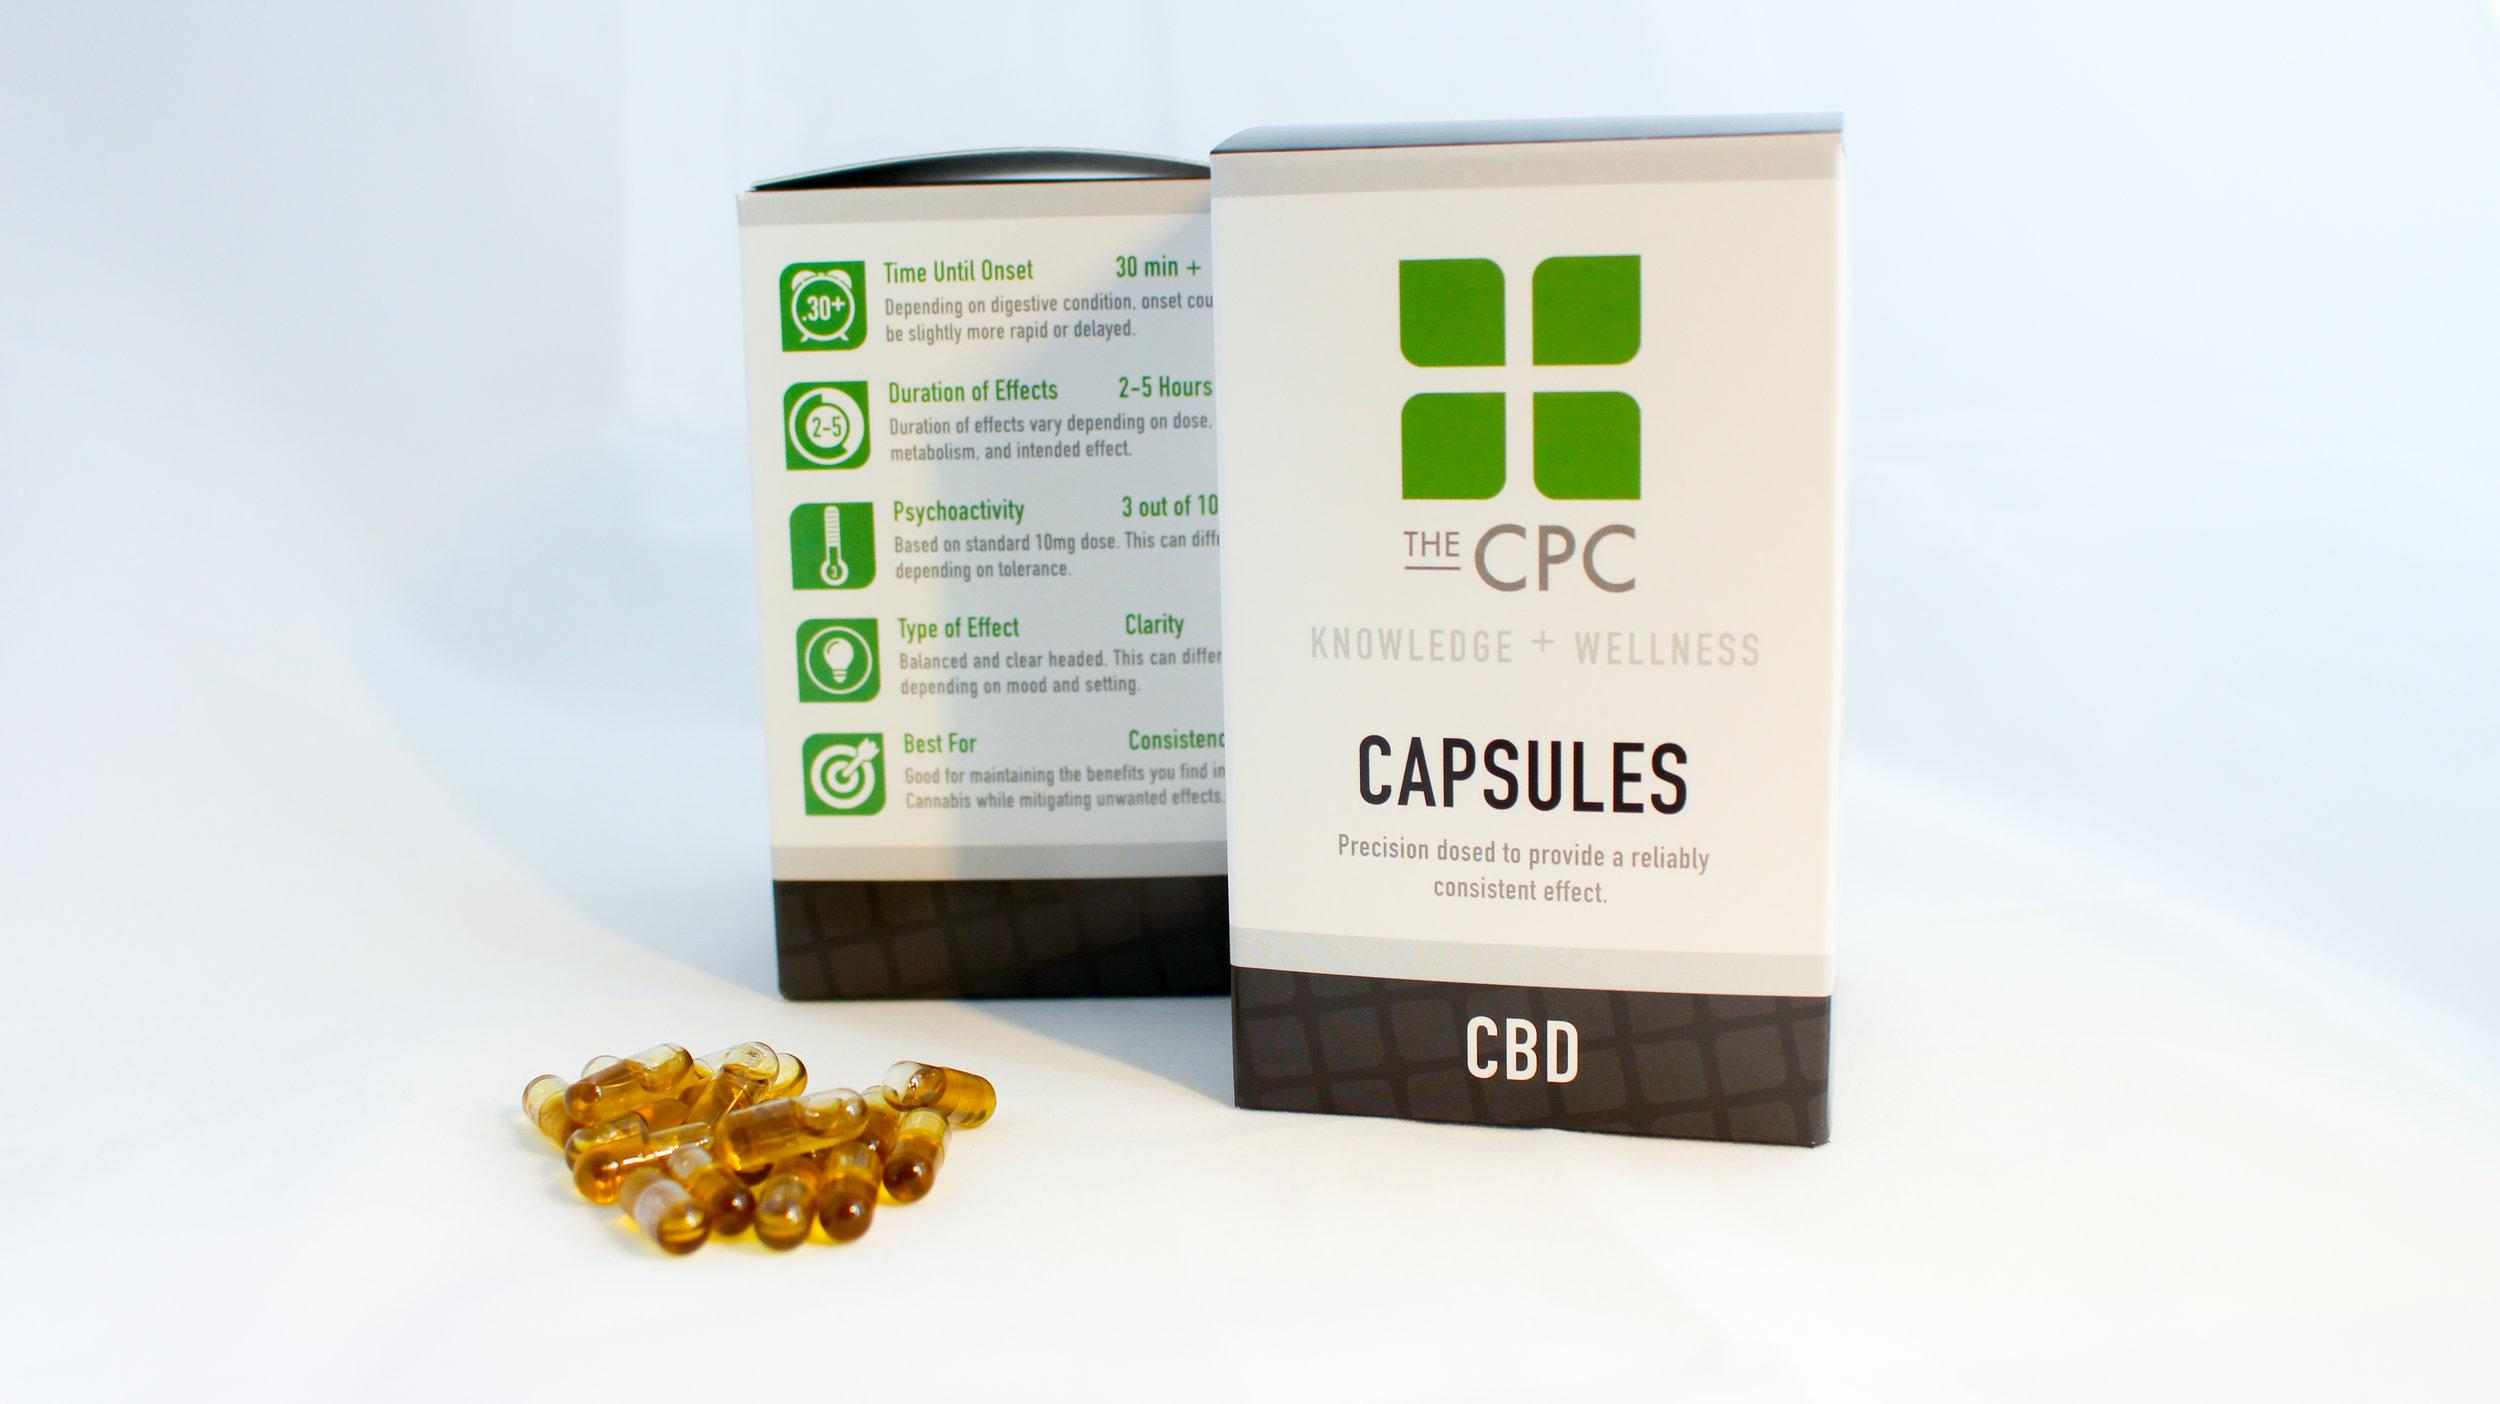 Twenty 5mg CBD & 5mg THC Capsules